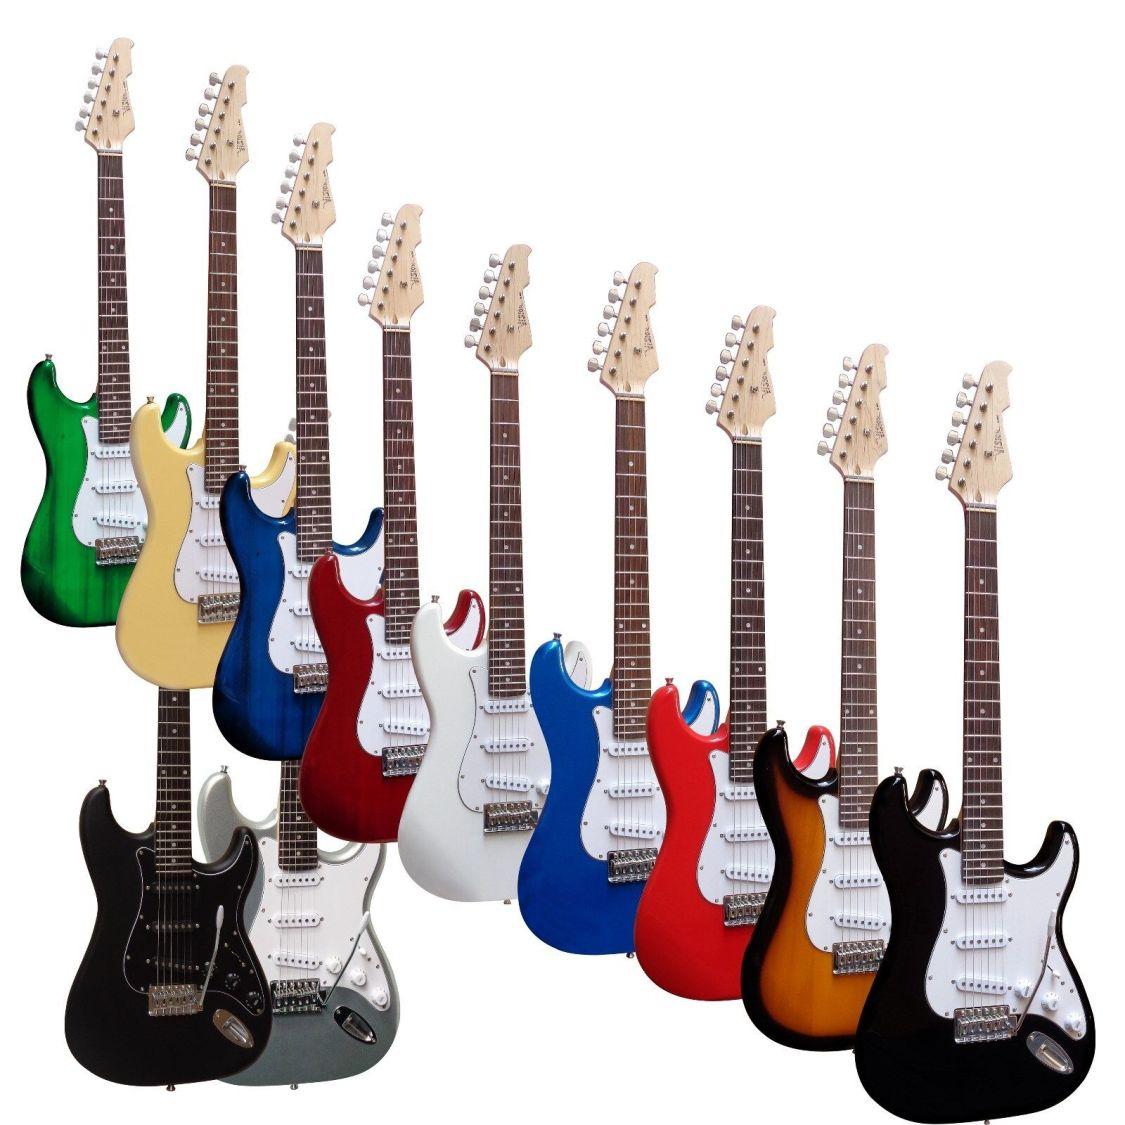 E-Gitarre MSA-ST5 schwarz, Massivholzkörper, Top AUSWAHL, mit Anschlußkabel!n